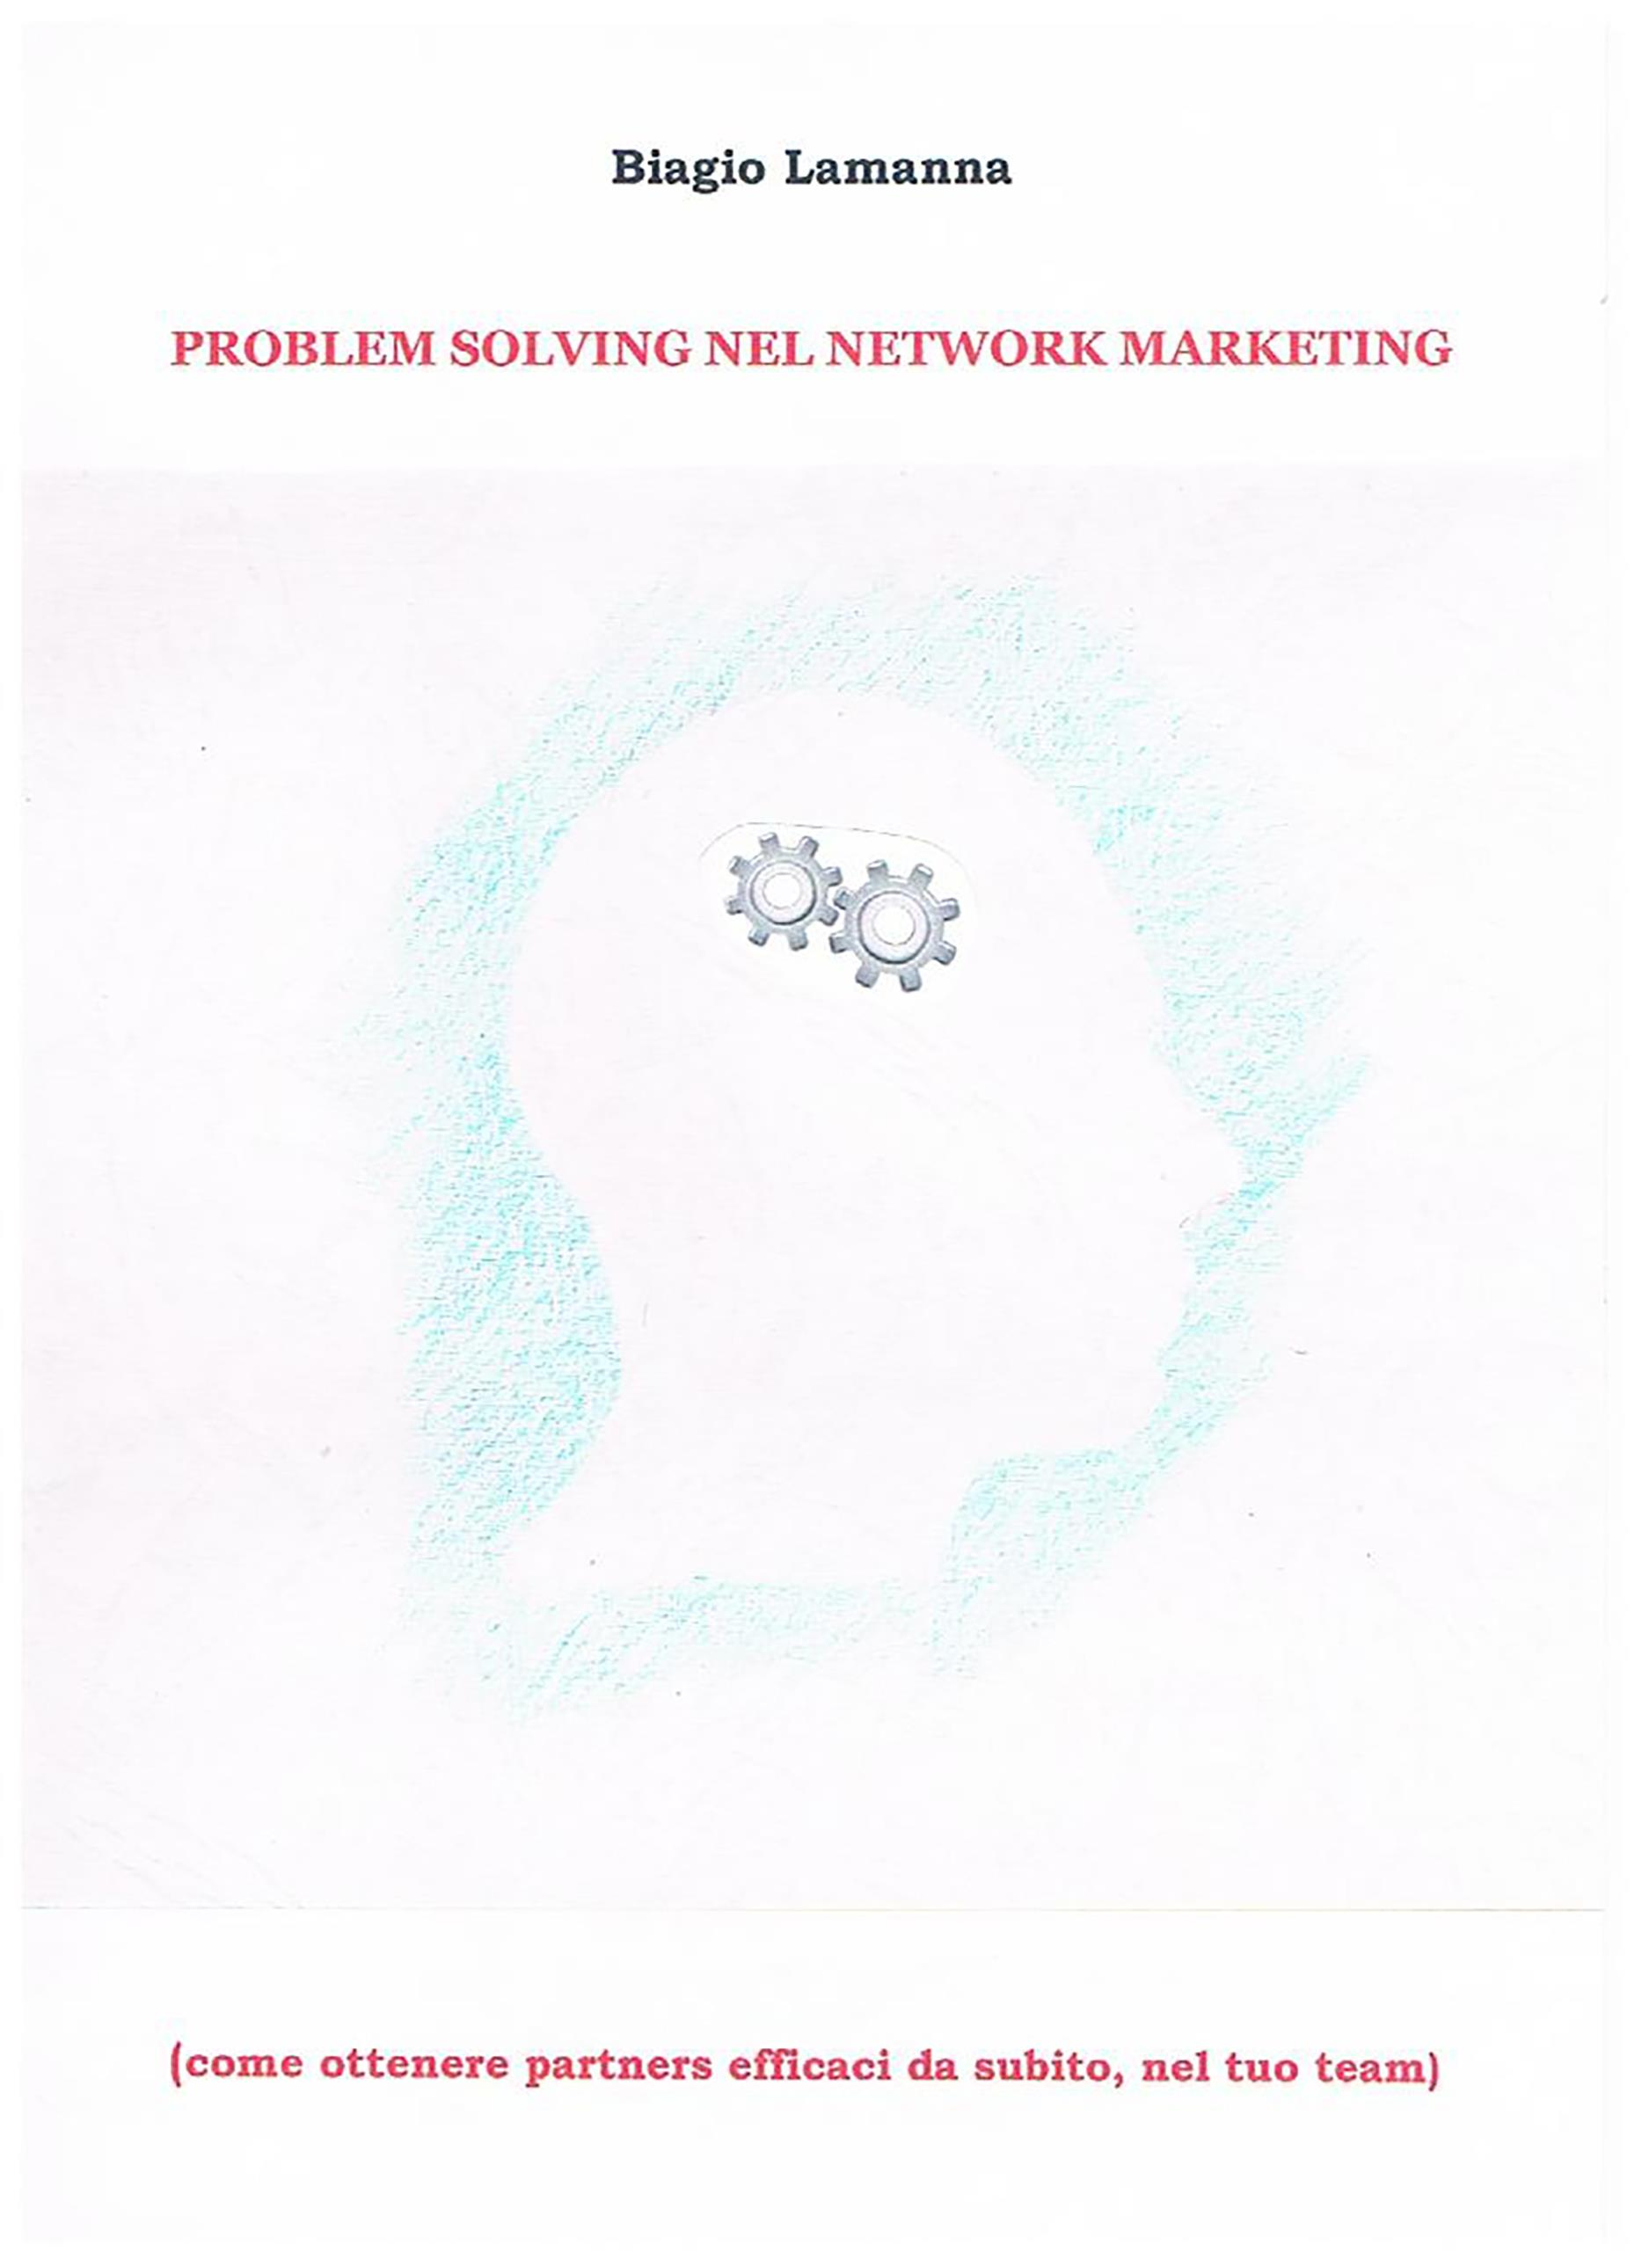 Problem solving nel network marketing